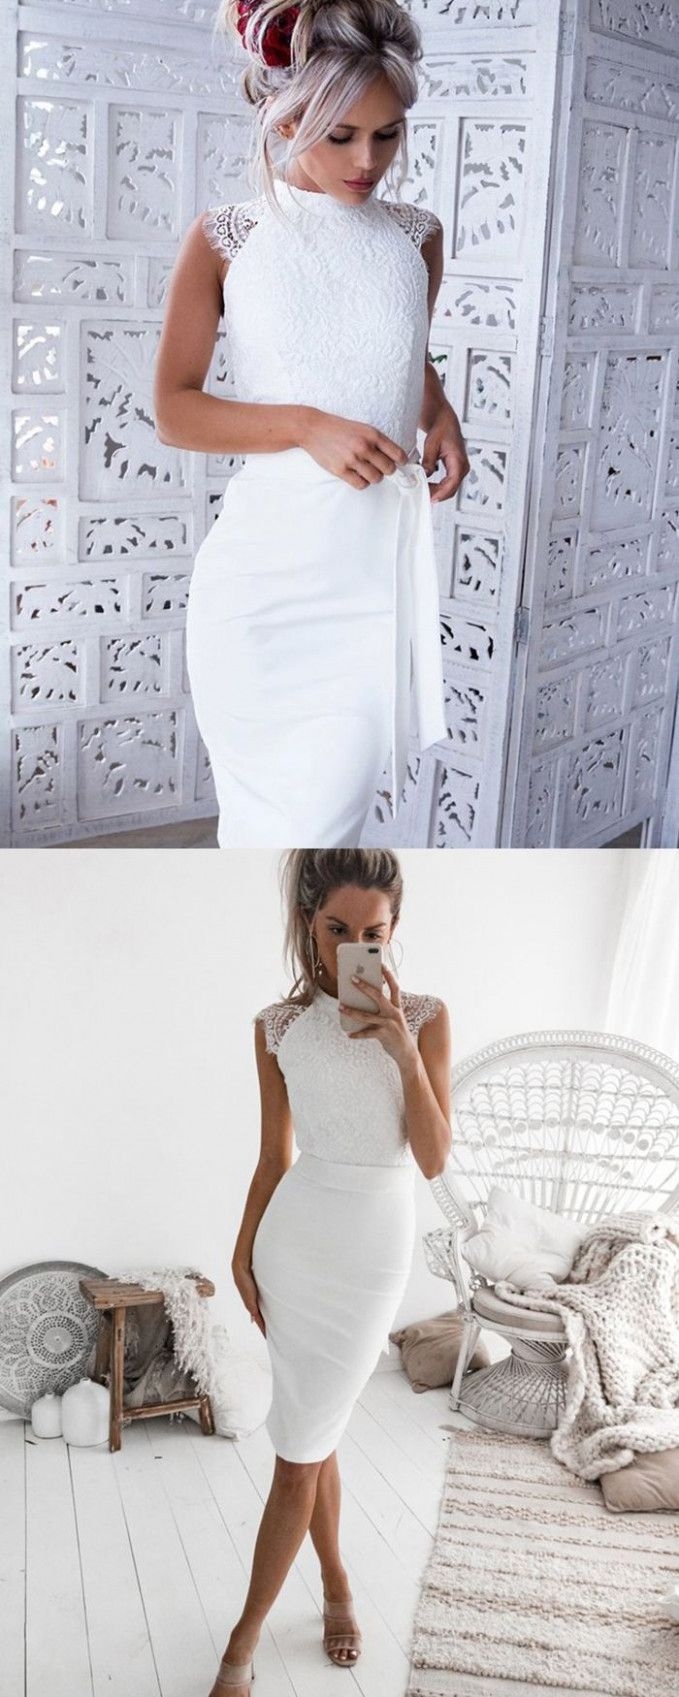 10 weißes kleid kurz | weiße kleider kurz, kurzes abendkleid